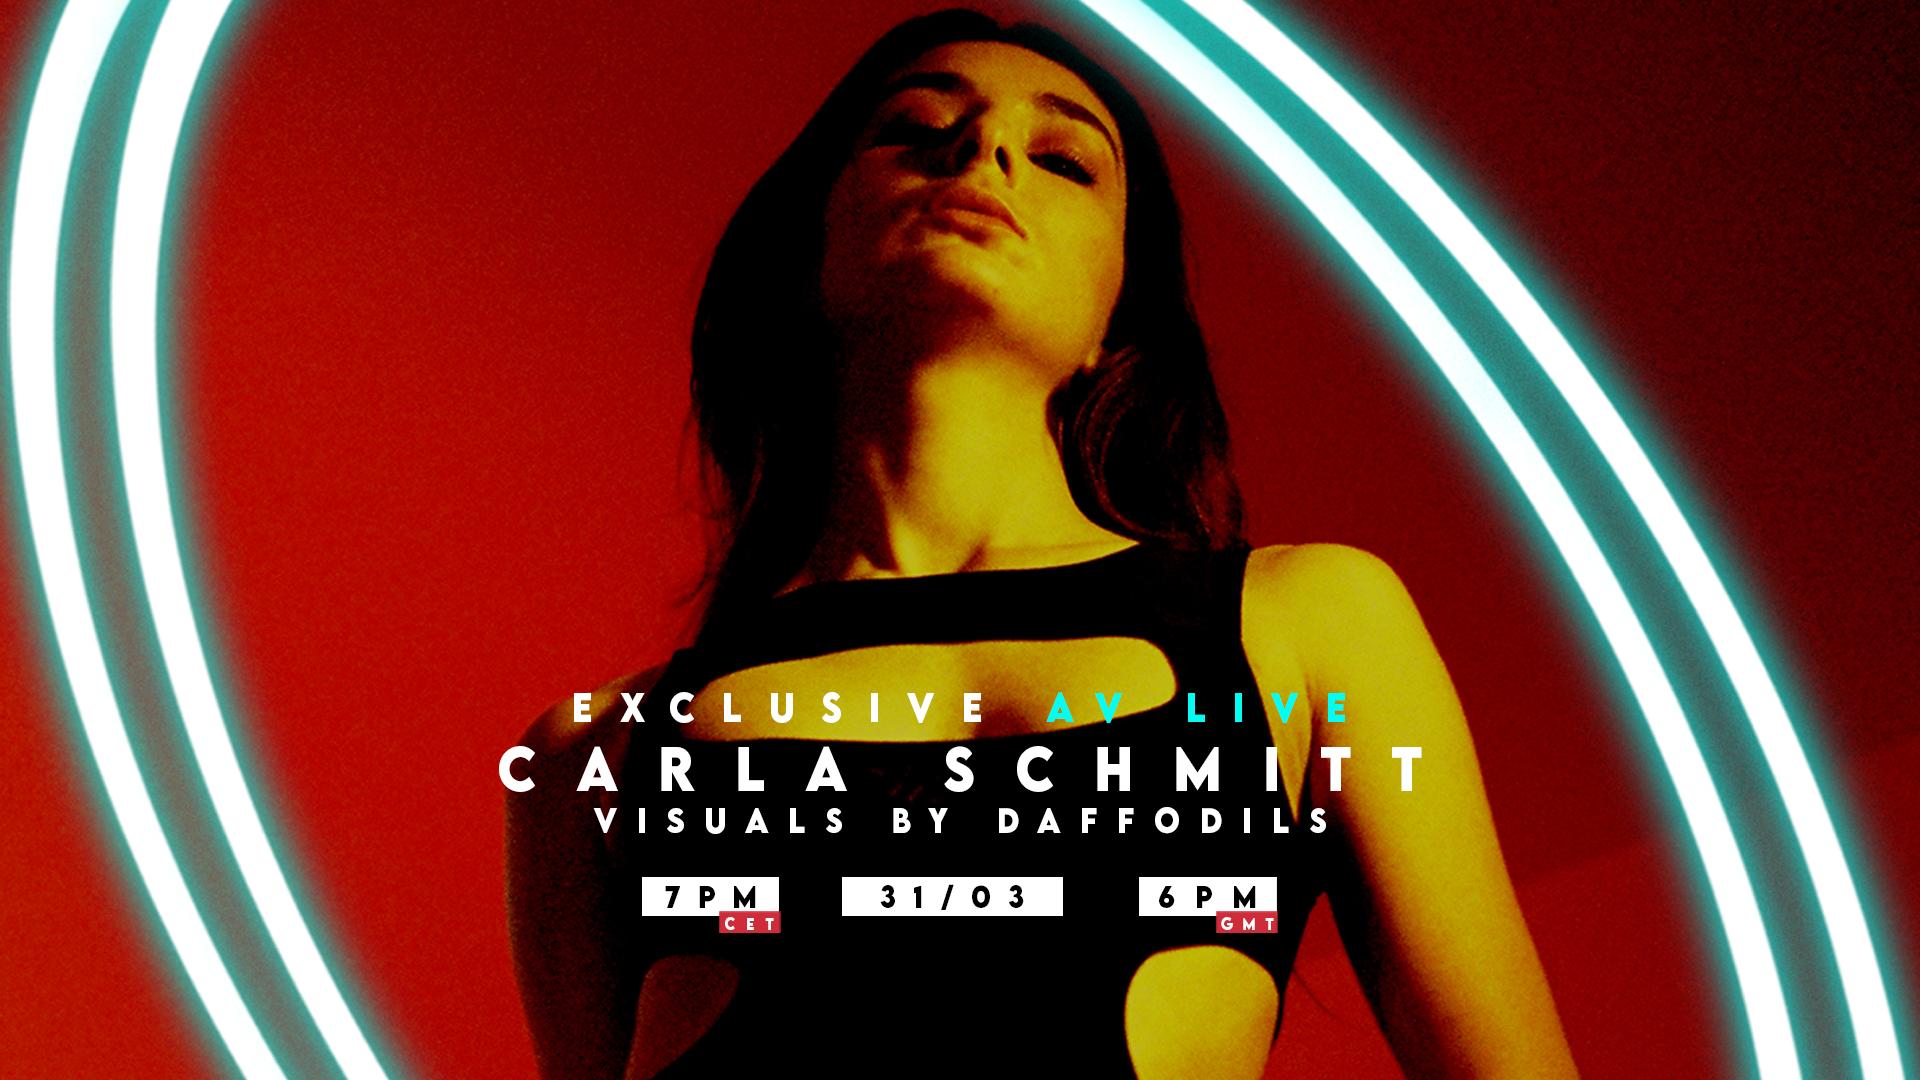 Carla Schmitt exclusive AV Live with Daffodils by La Quarantaine